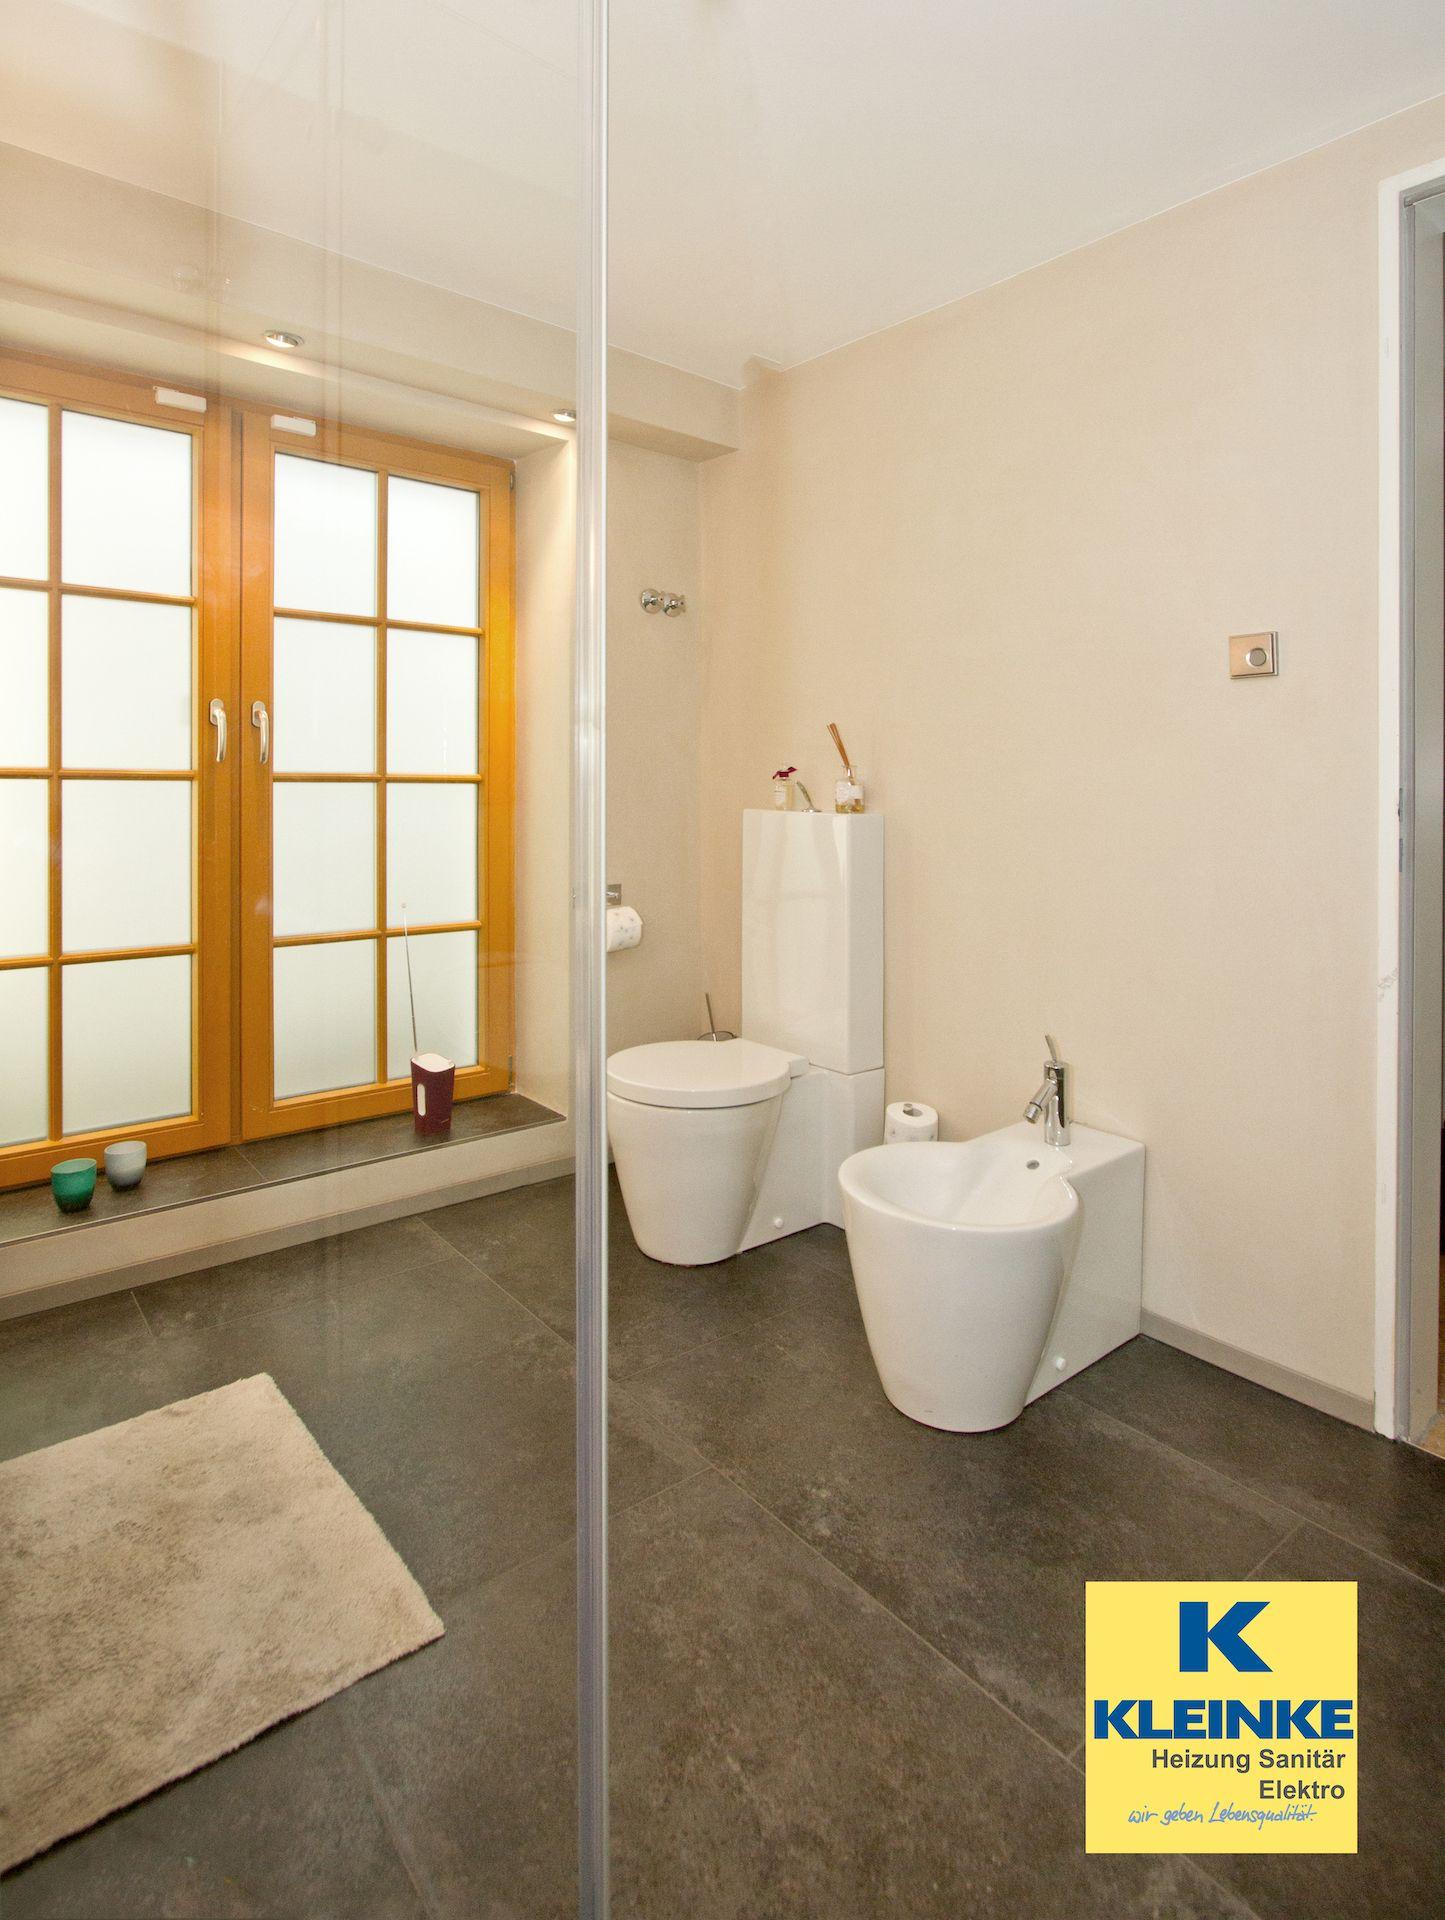 Home Badezimmer Erneuerbare Energien Baden